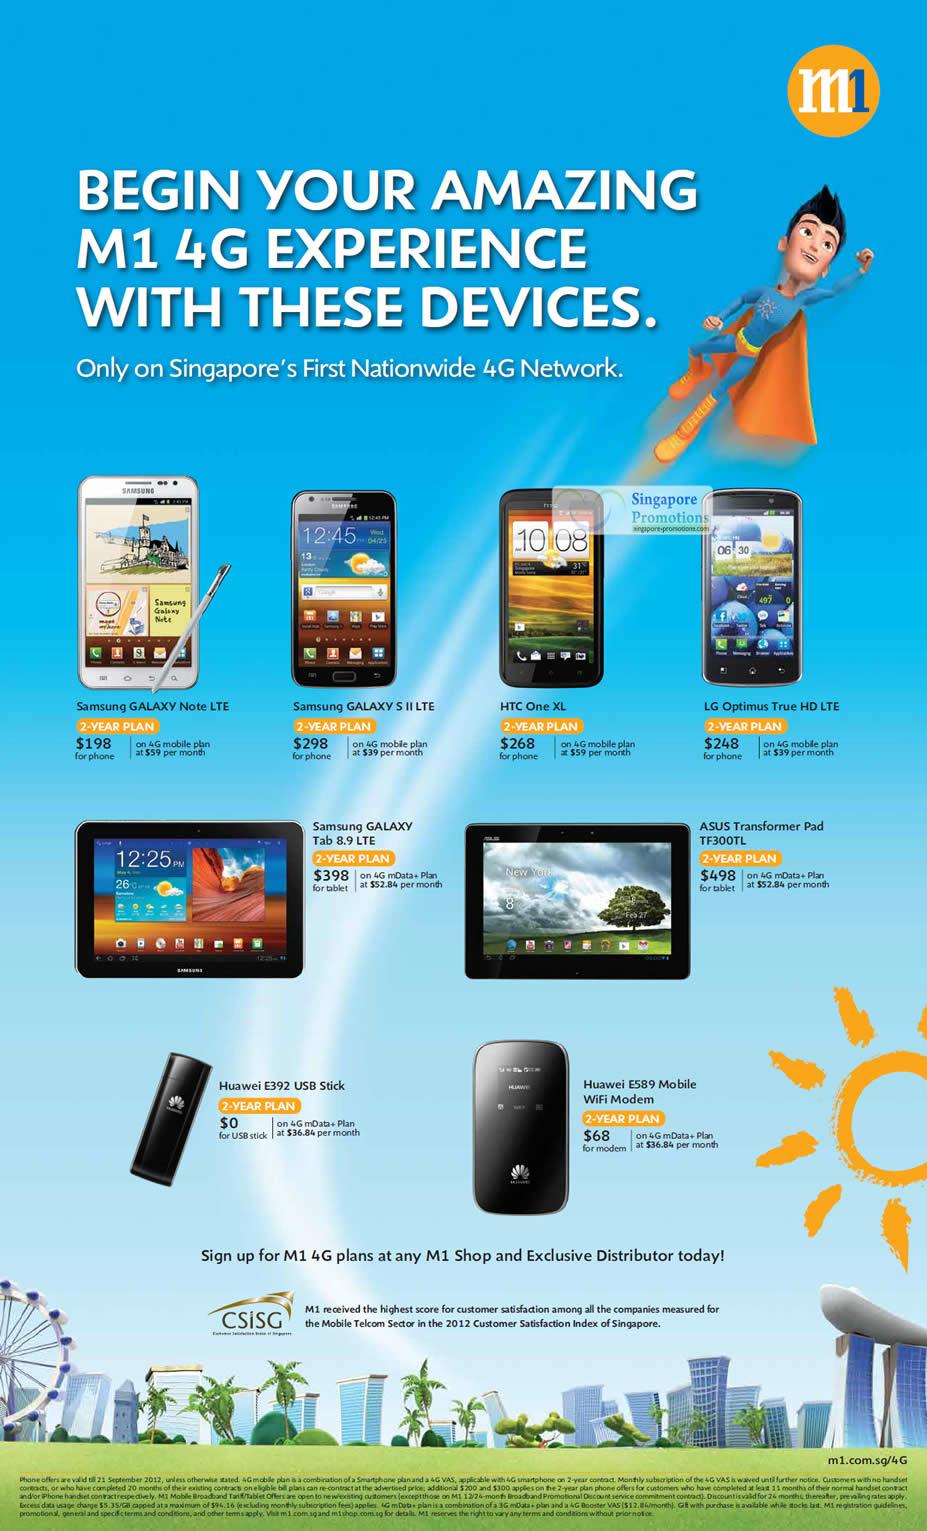 Samsung Galaxy Note LTE, Samsung Galaxy S II LTE, Samsung Galaxy Tab 8.9 LTE, HTC One XL, LG Optimus True HD LTE, ASUS Transformer Pad TF300TL